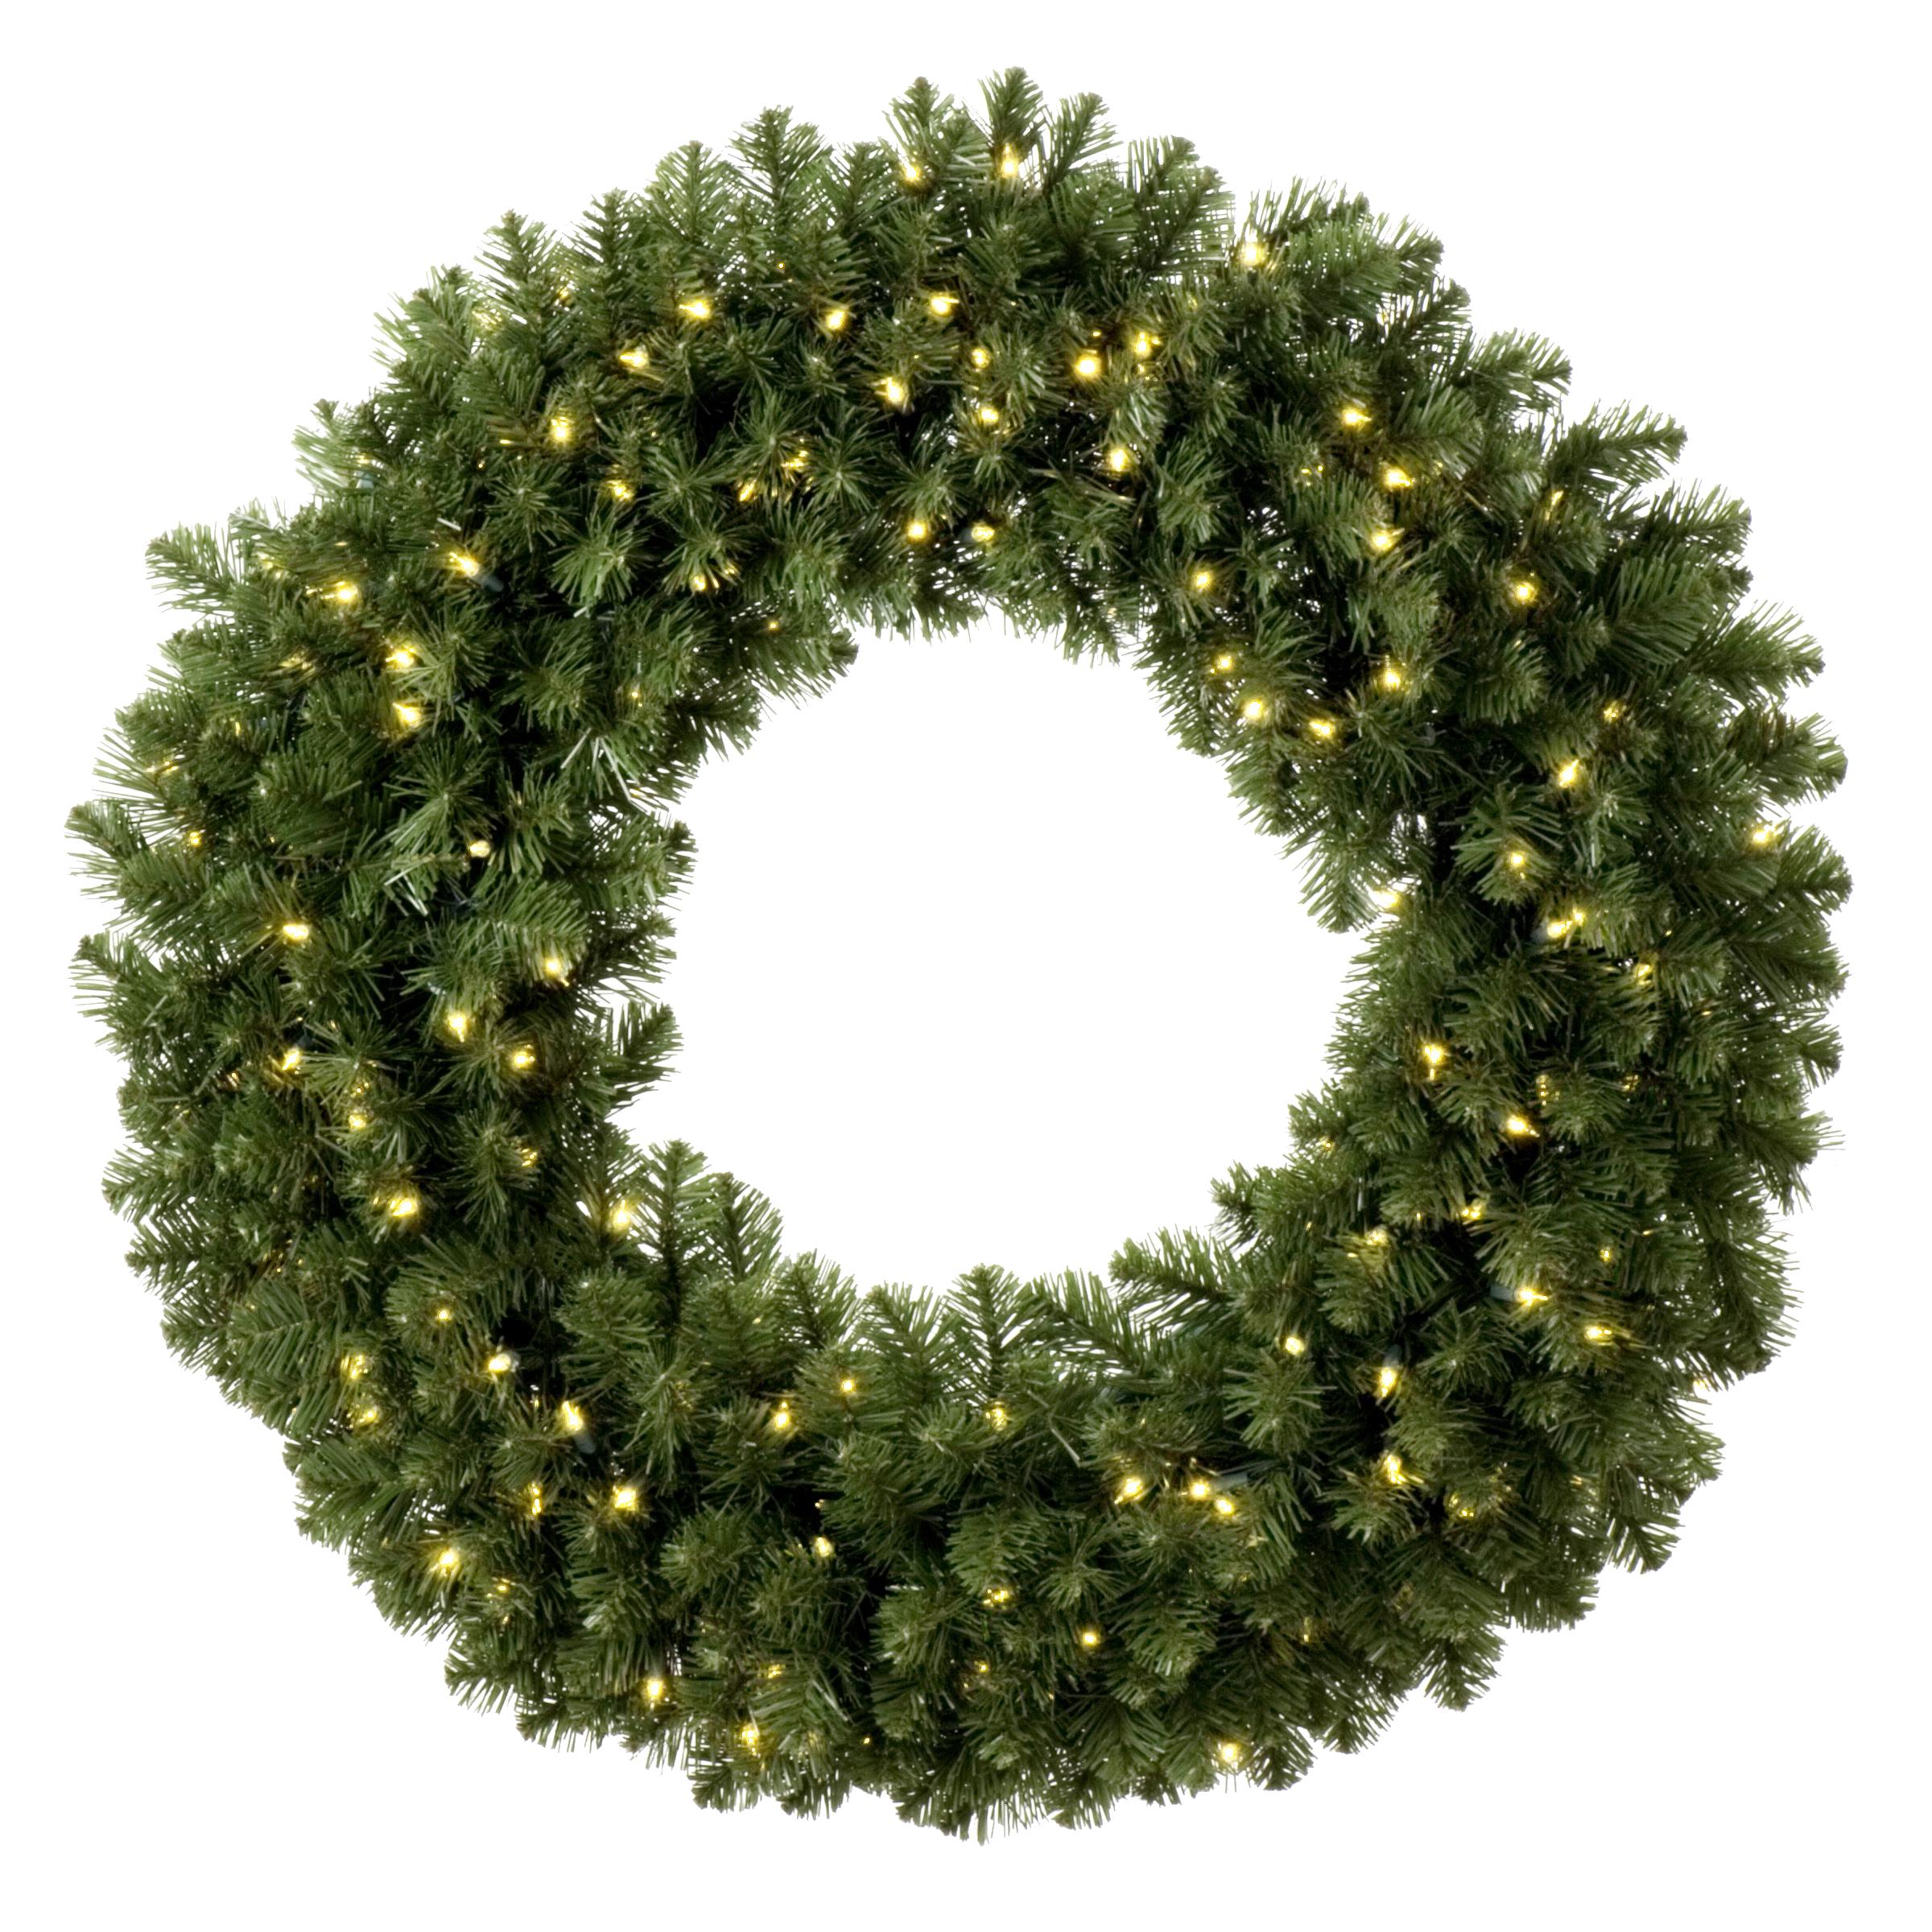 Christmas Reef Png.Download Christmas Wreath Photo Hq Png Image Freepngimg